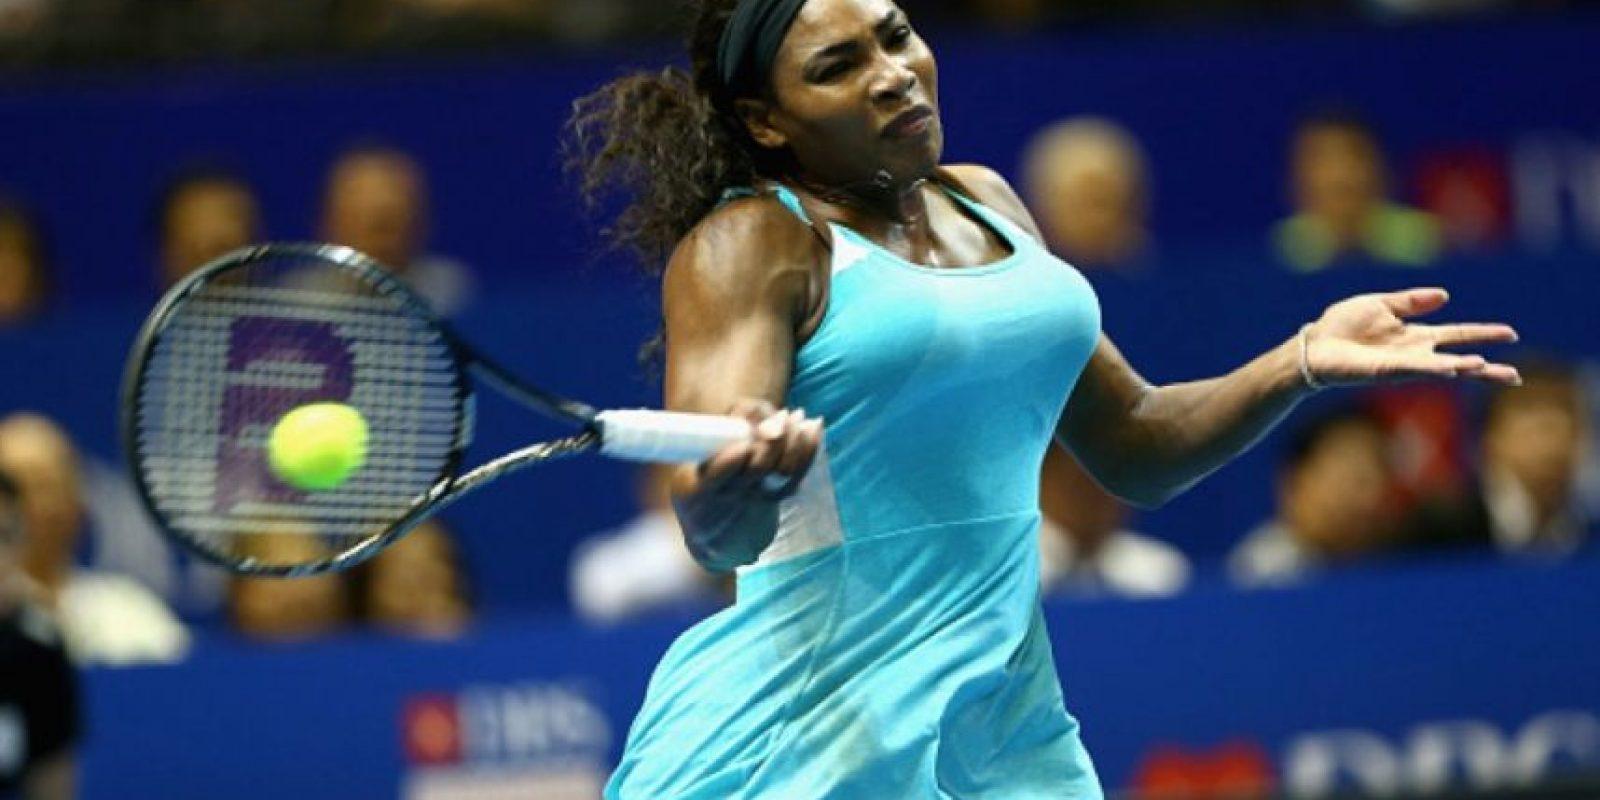 La tenista ganó 22 millones de dólares. Foto:Getty Images